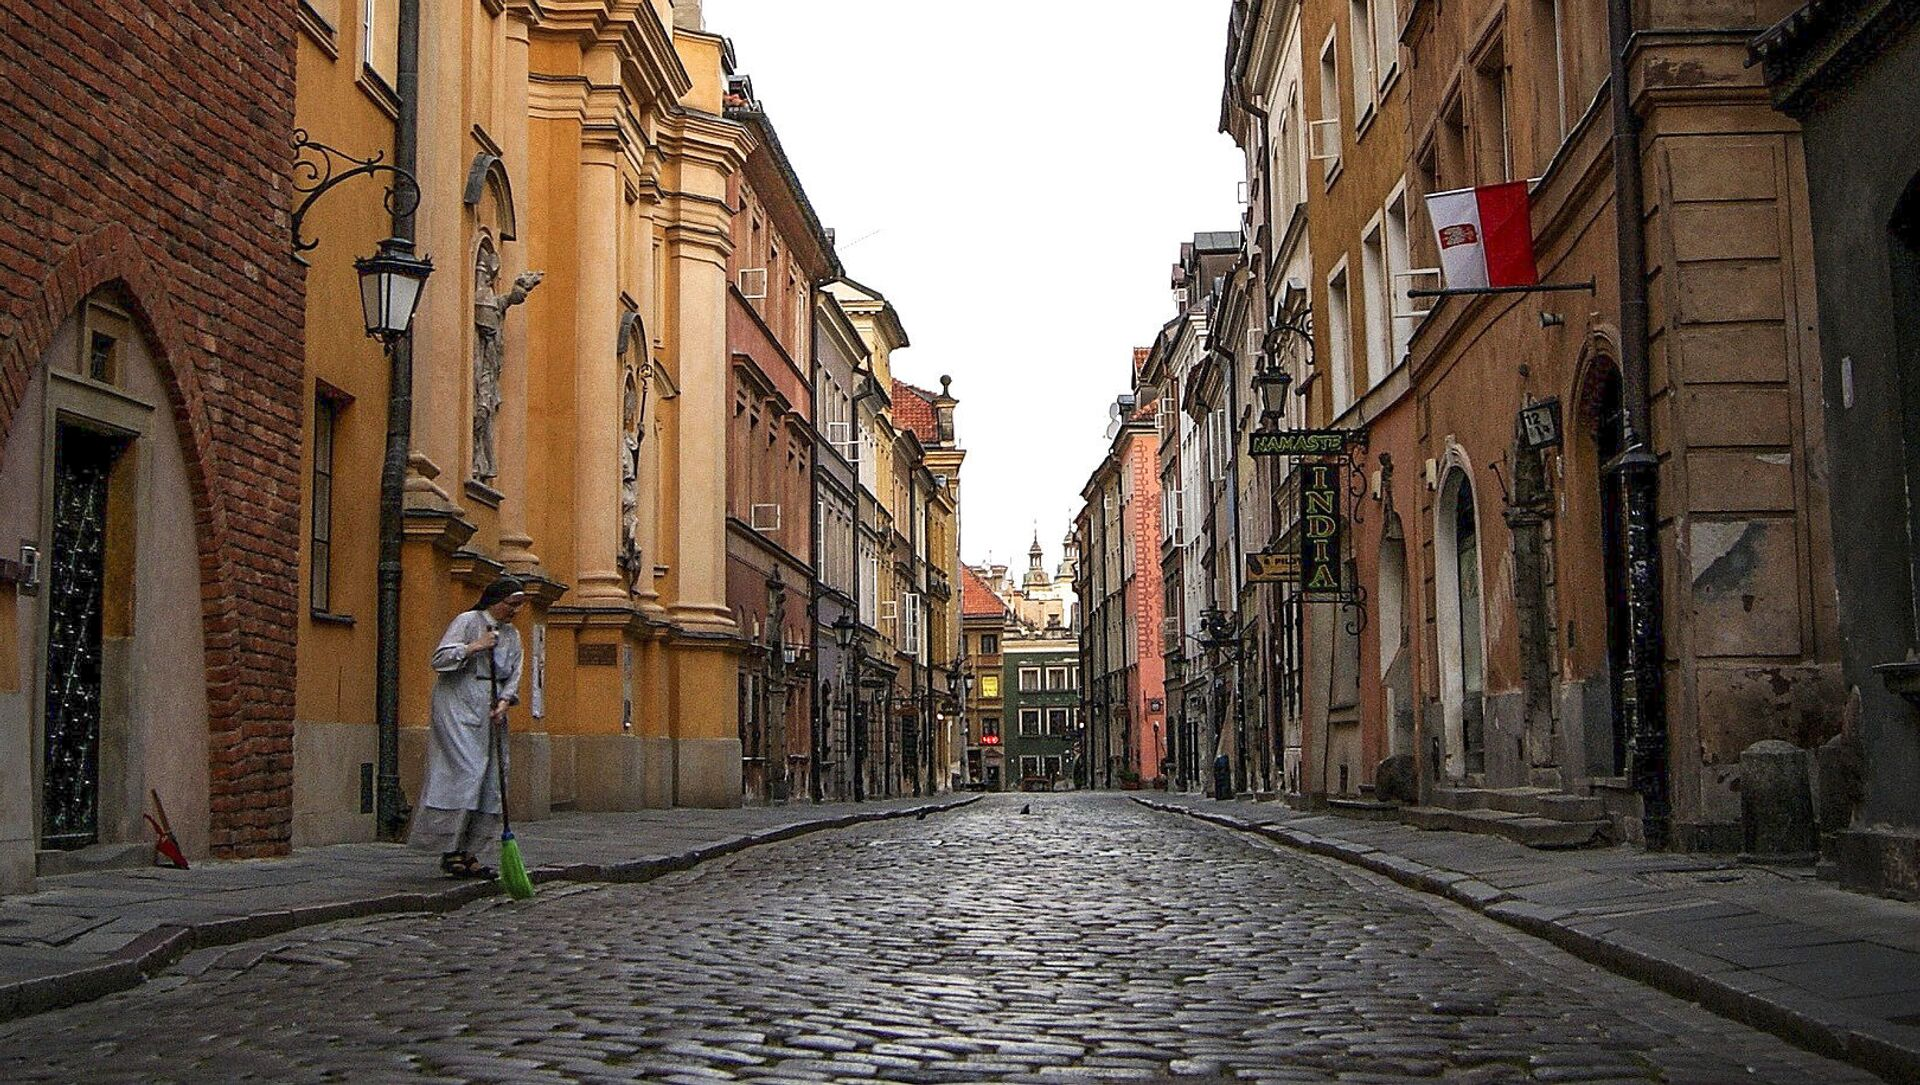 Varšava, Polsko - Sputnik Česká republika, 1920, 27.02.2021